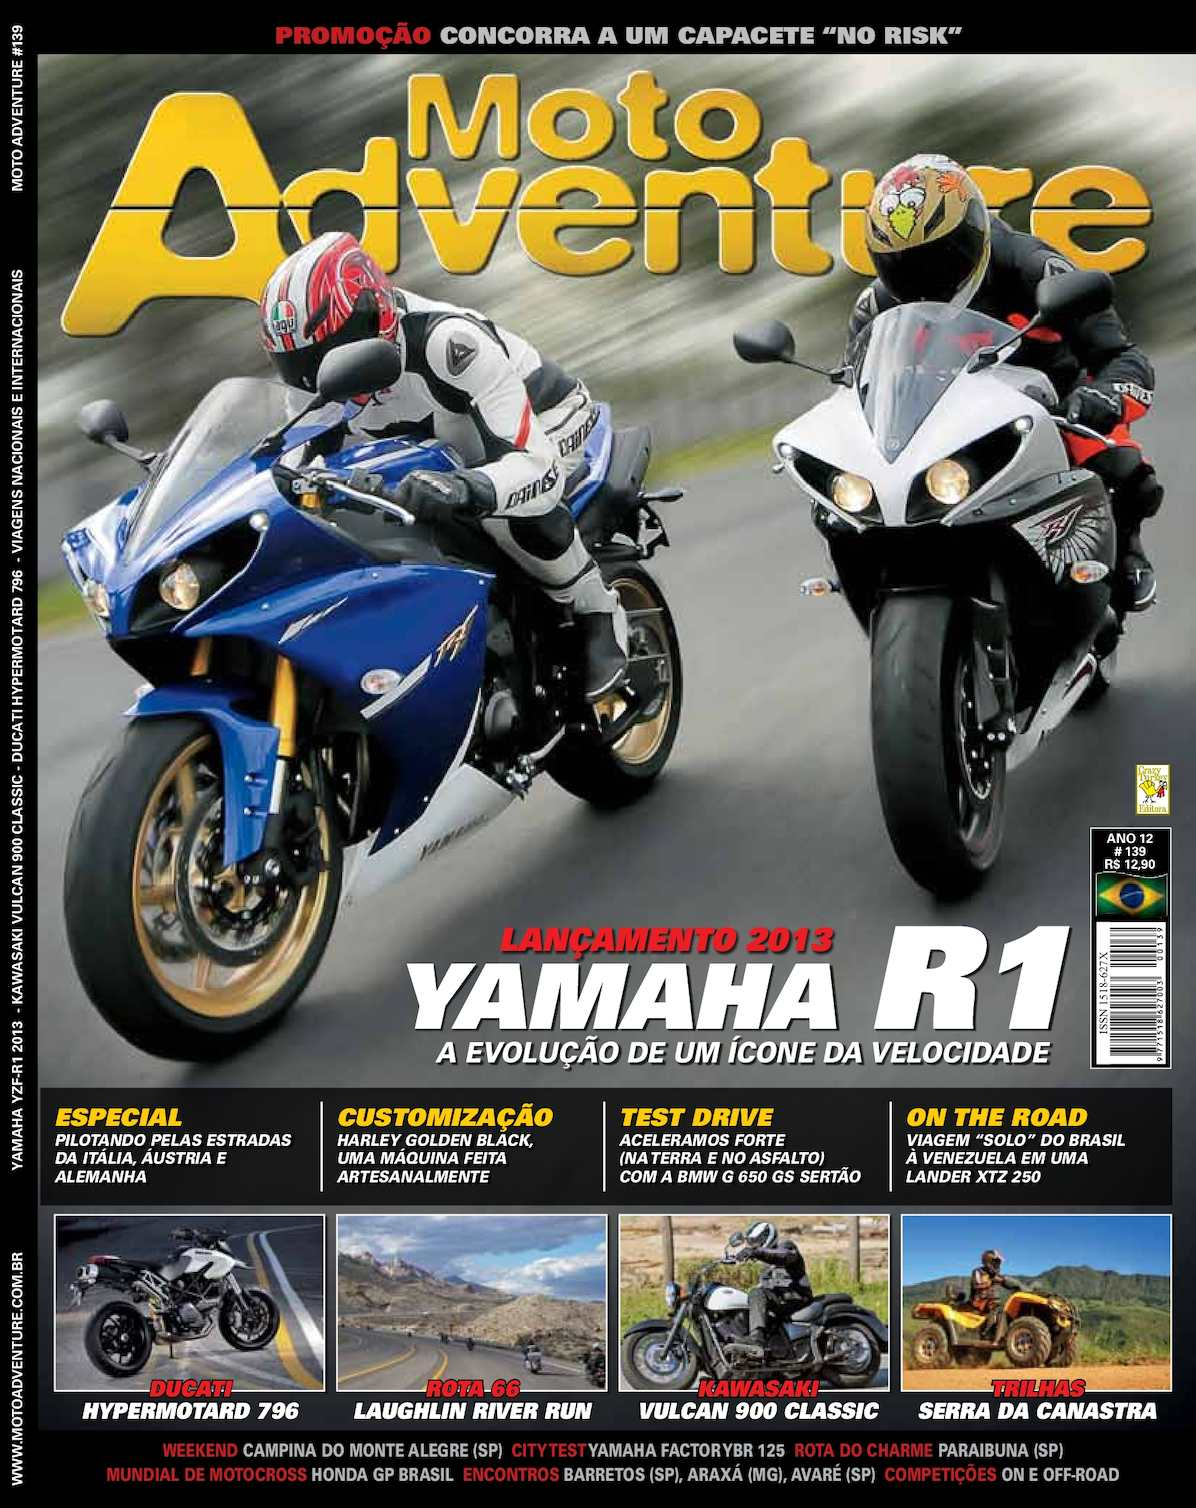 Calaméo - Moto Adventure 139 Web Junho 973cf82ed373f